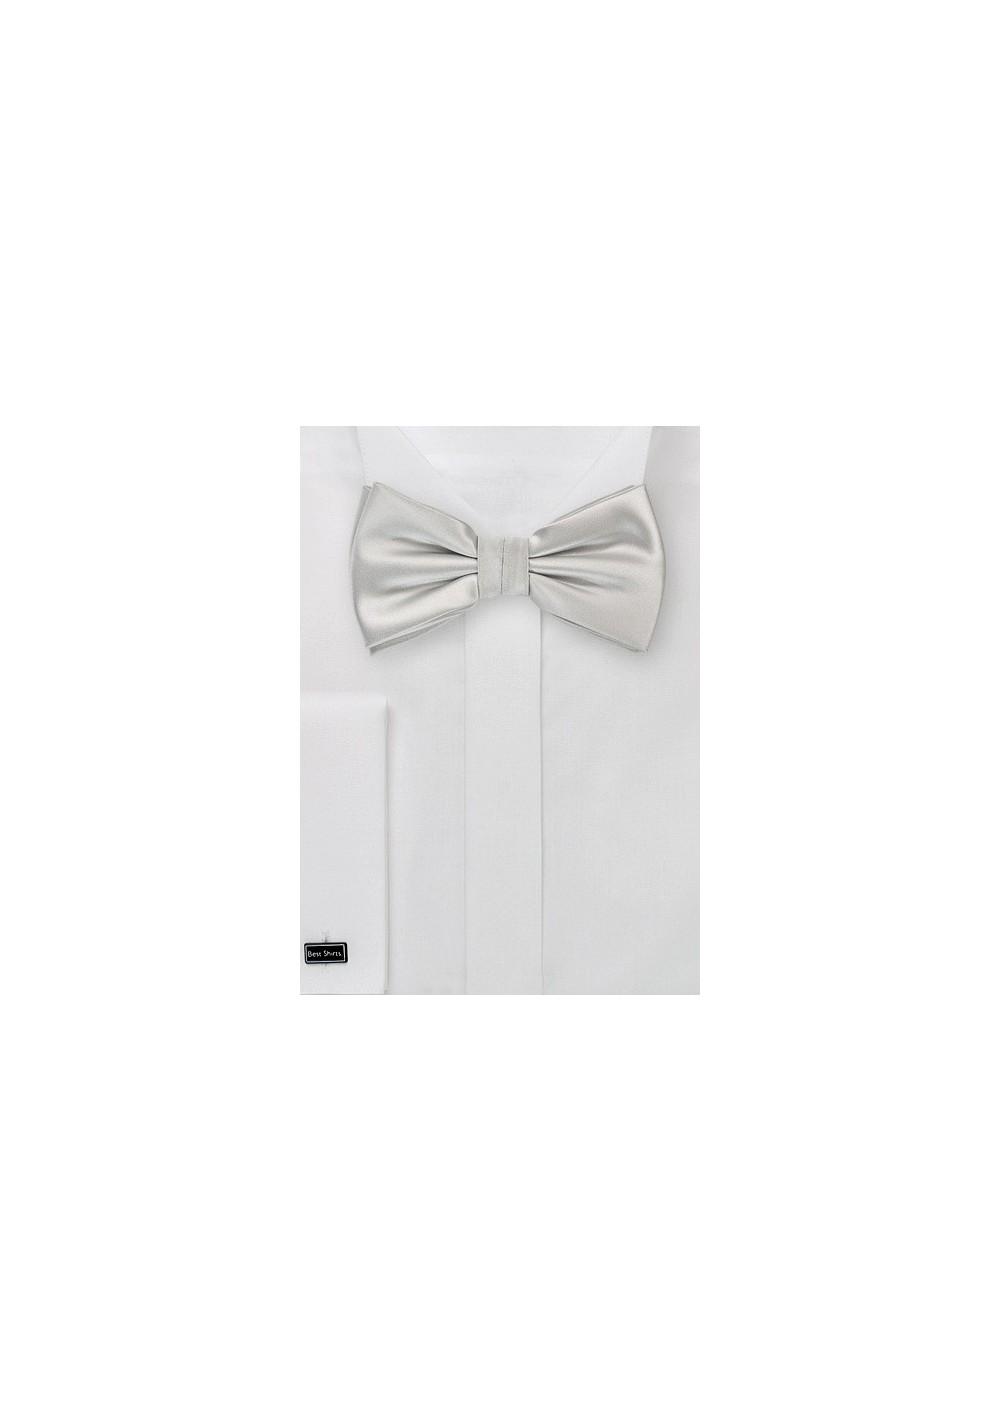 Light Platinum Silver Bow Tie